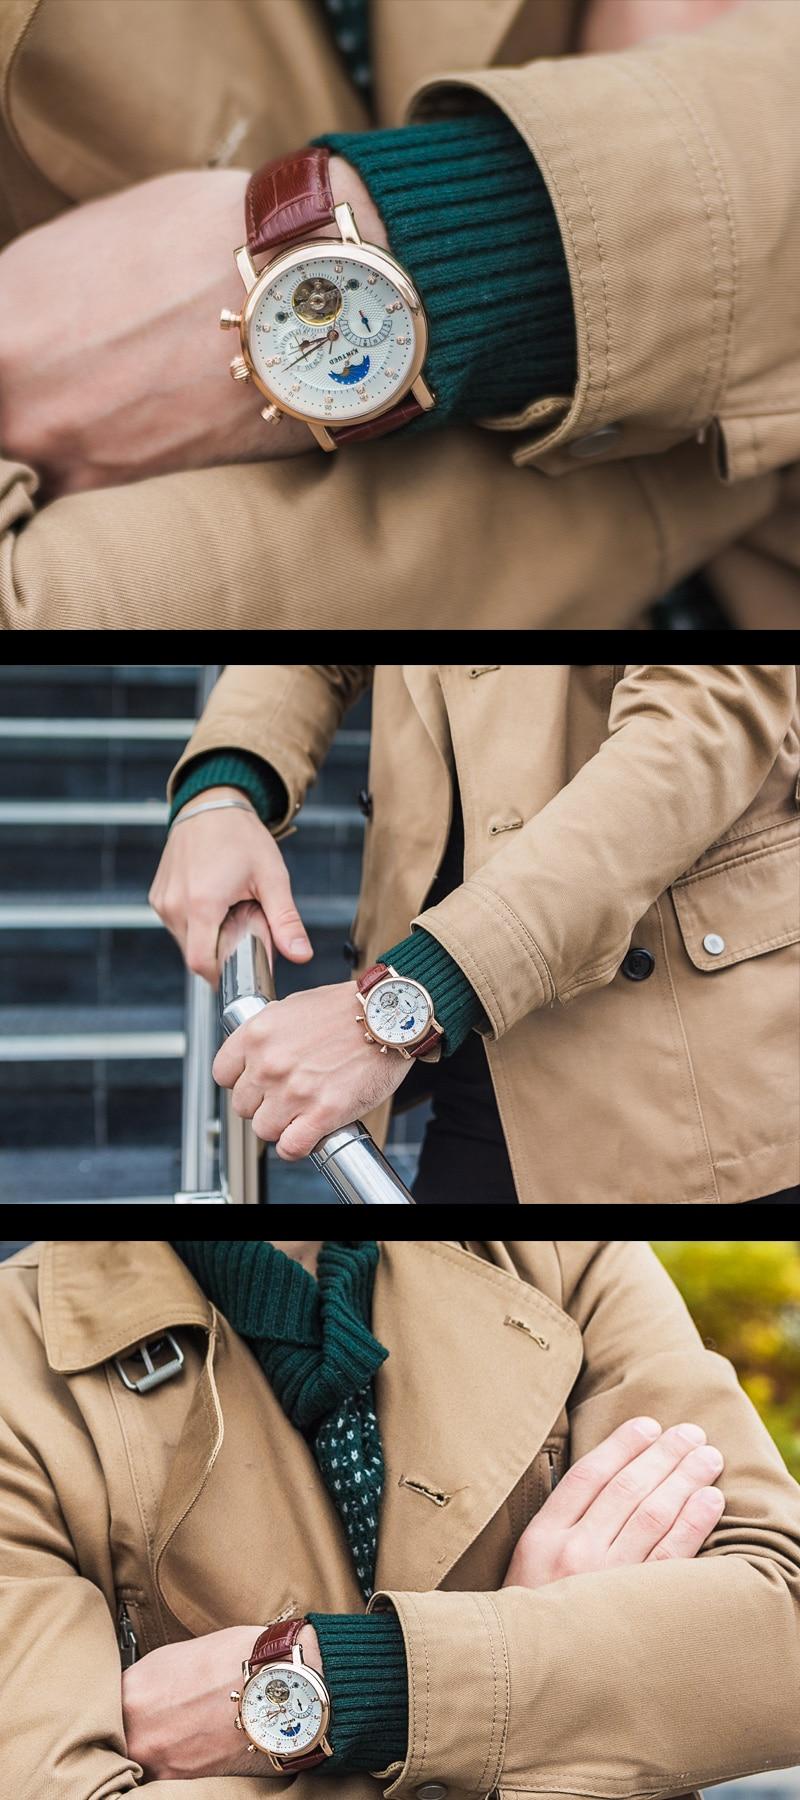 HTB166EqXEjrK1RkHFNRq6ySvpXap KINYUED Moon Phase Top Brand Mens Mechanical Watches Automatic Tourbillon Skeleton Watch Men Calendar Relogio Masculino dropship